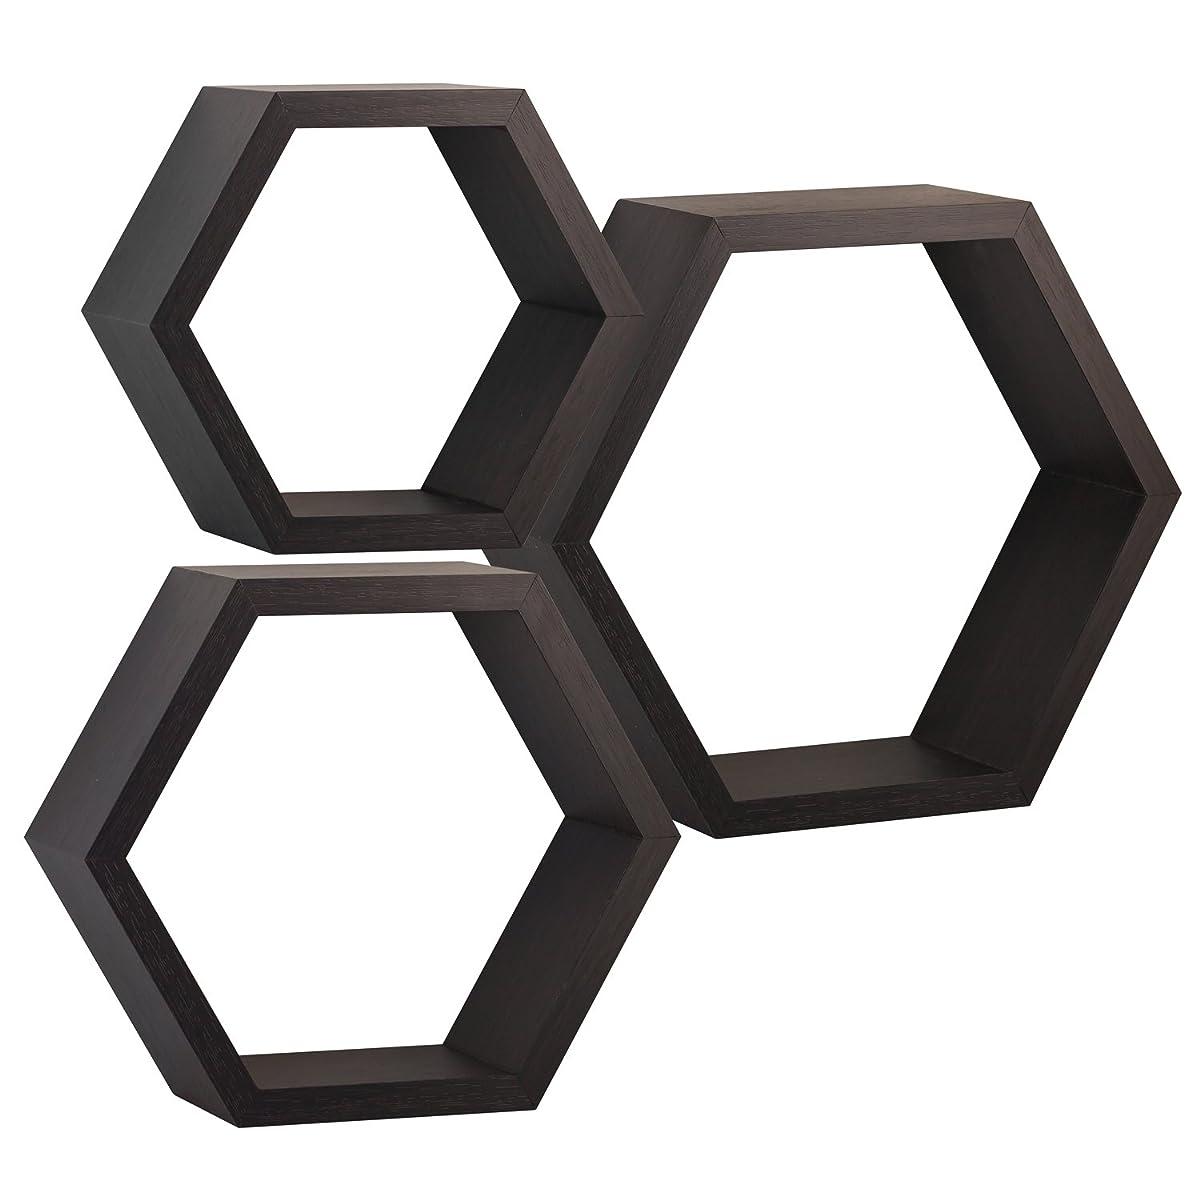 Halter Hexagonal Shaped Floating Shelves (Brown) For Wall/Room Decorative Display - Set of Three - Easy Installation,Screws & Hardware Included - Wood Veneer